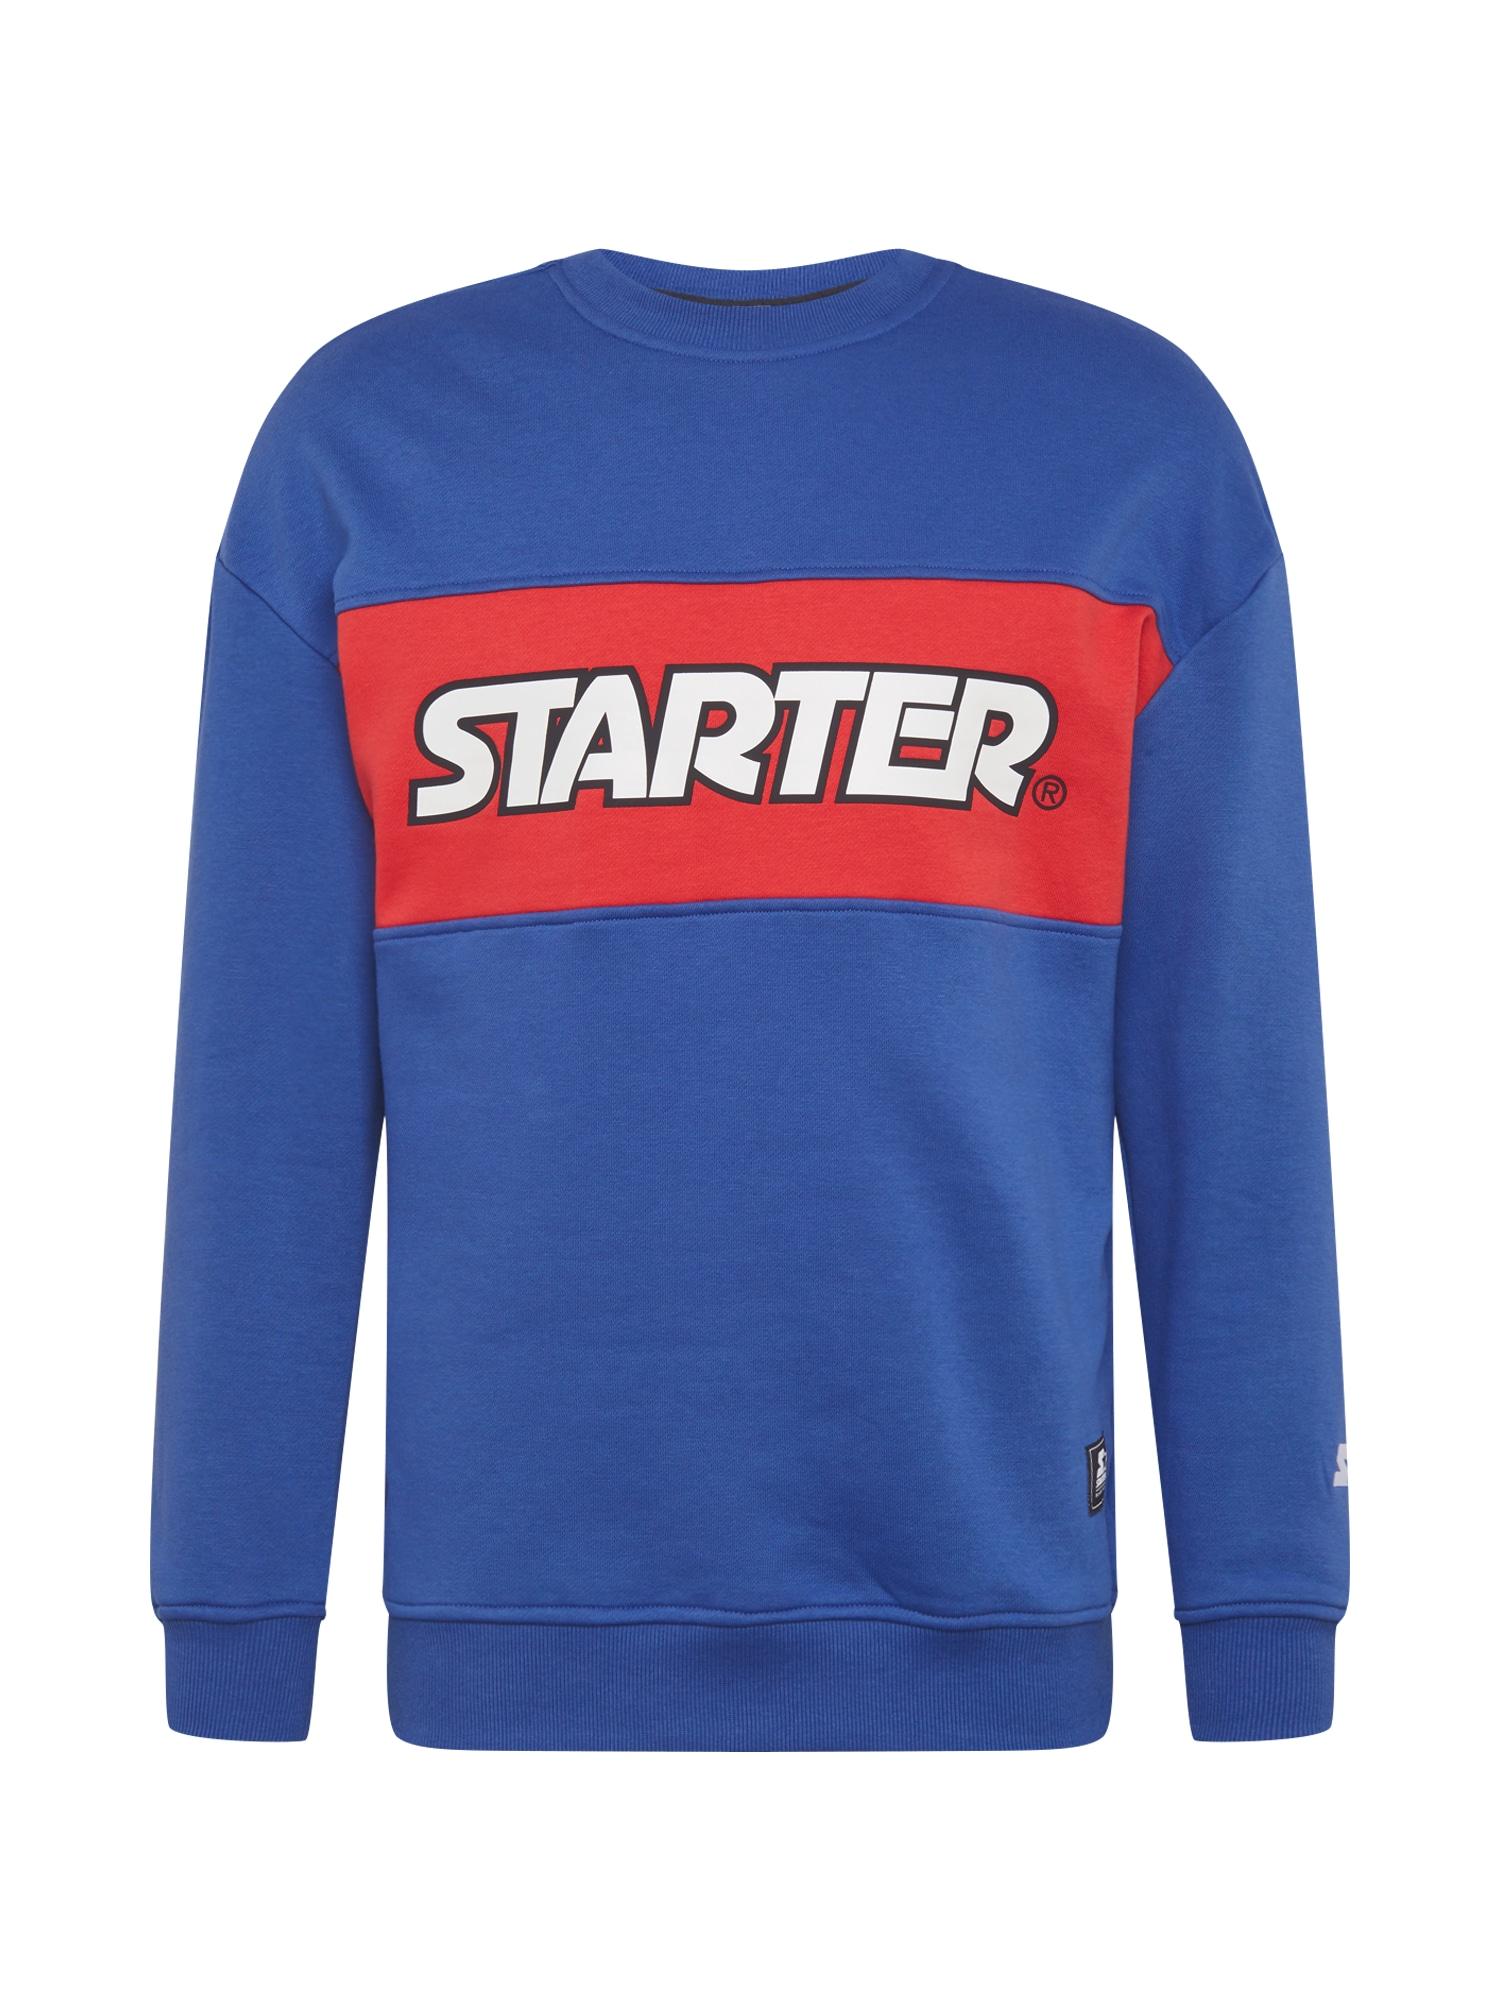 "Starter Black Label Megztinis be užsegimo sodri mėlyna (""karališka"") / granatų spalva / balta / juoda"